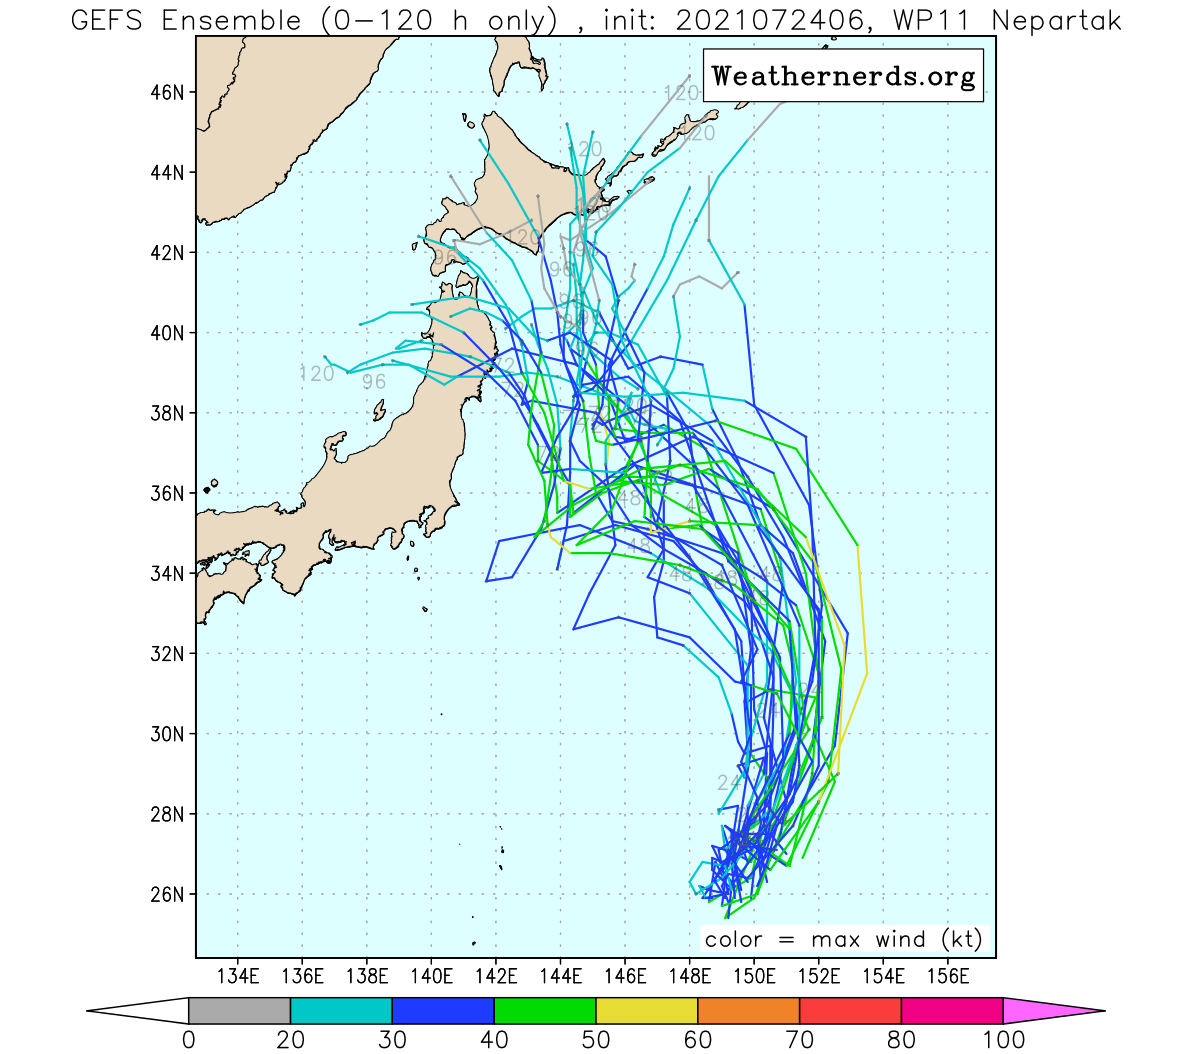 typhoon-in-fa-shanghai-catastrophic-floods-china-nepartak-japan-track